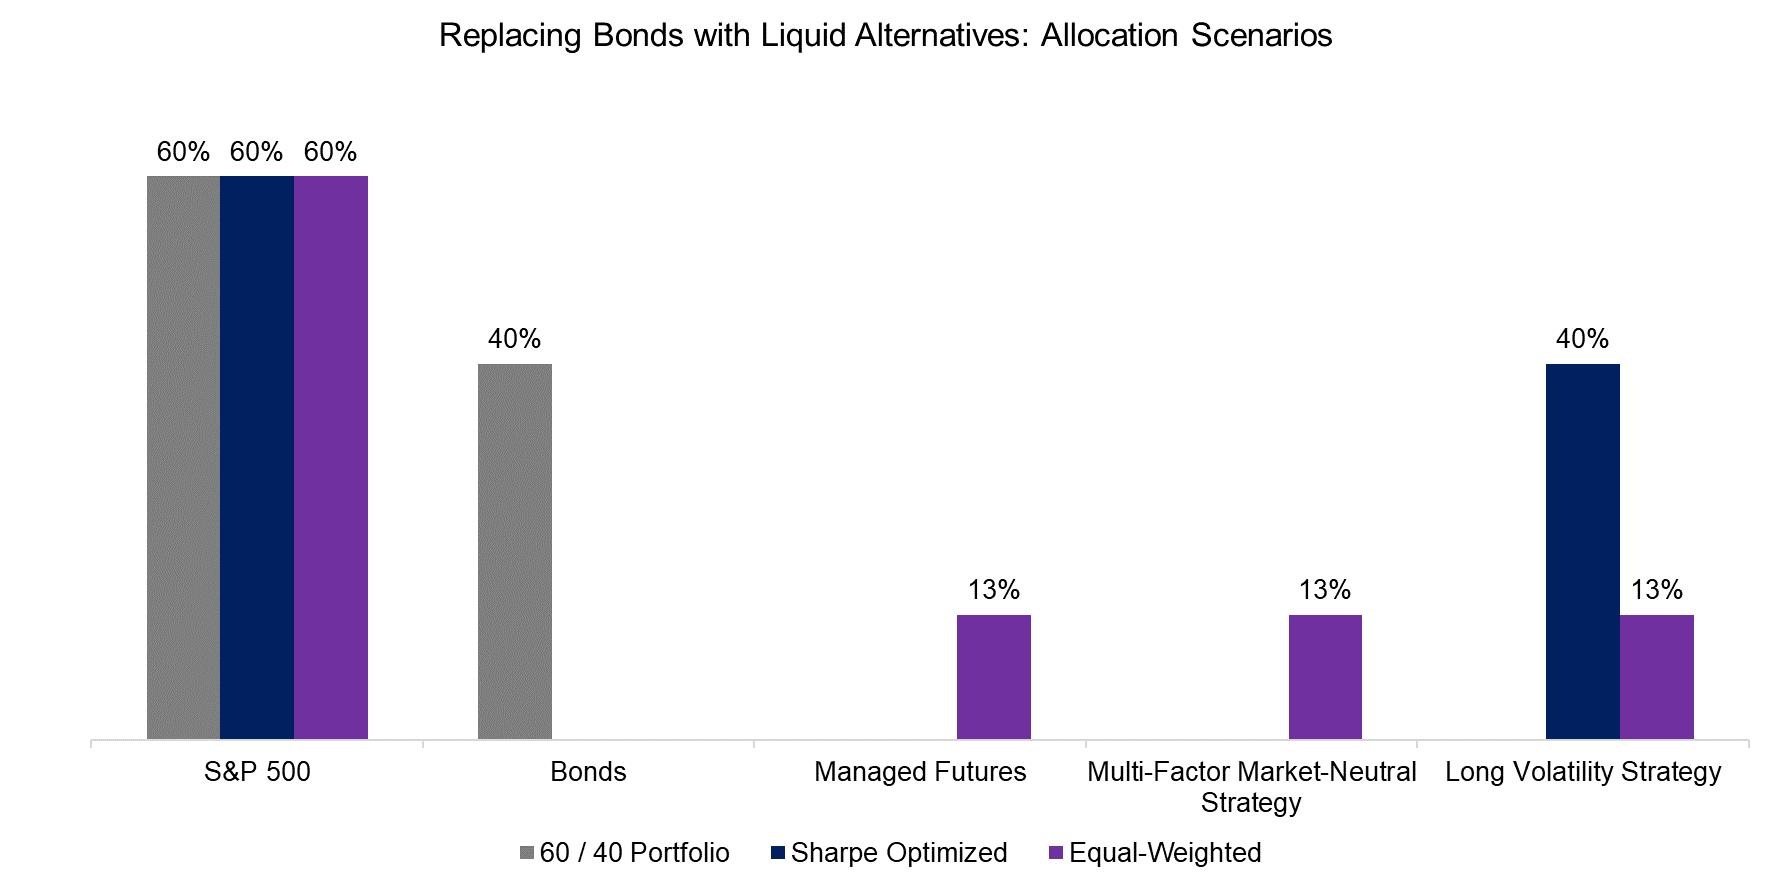 Replacing Bonds with Liquid Alternatives Allocation Scenarios